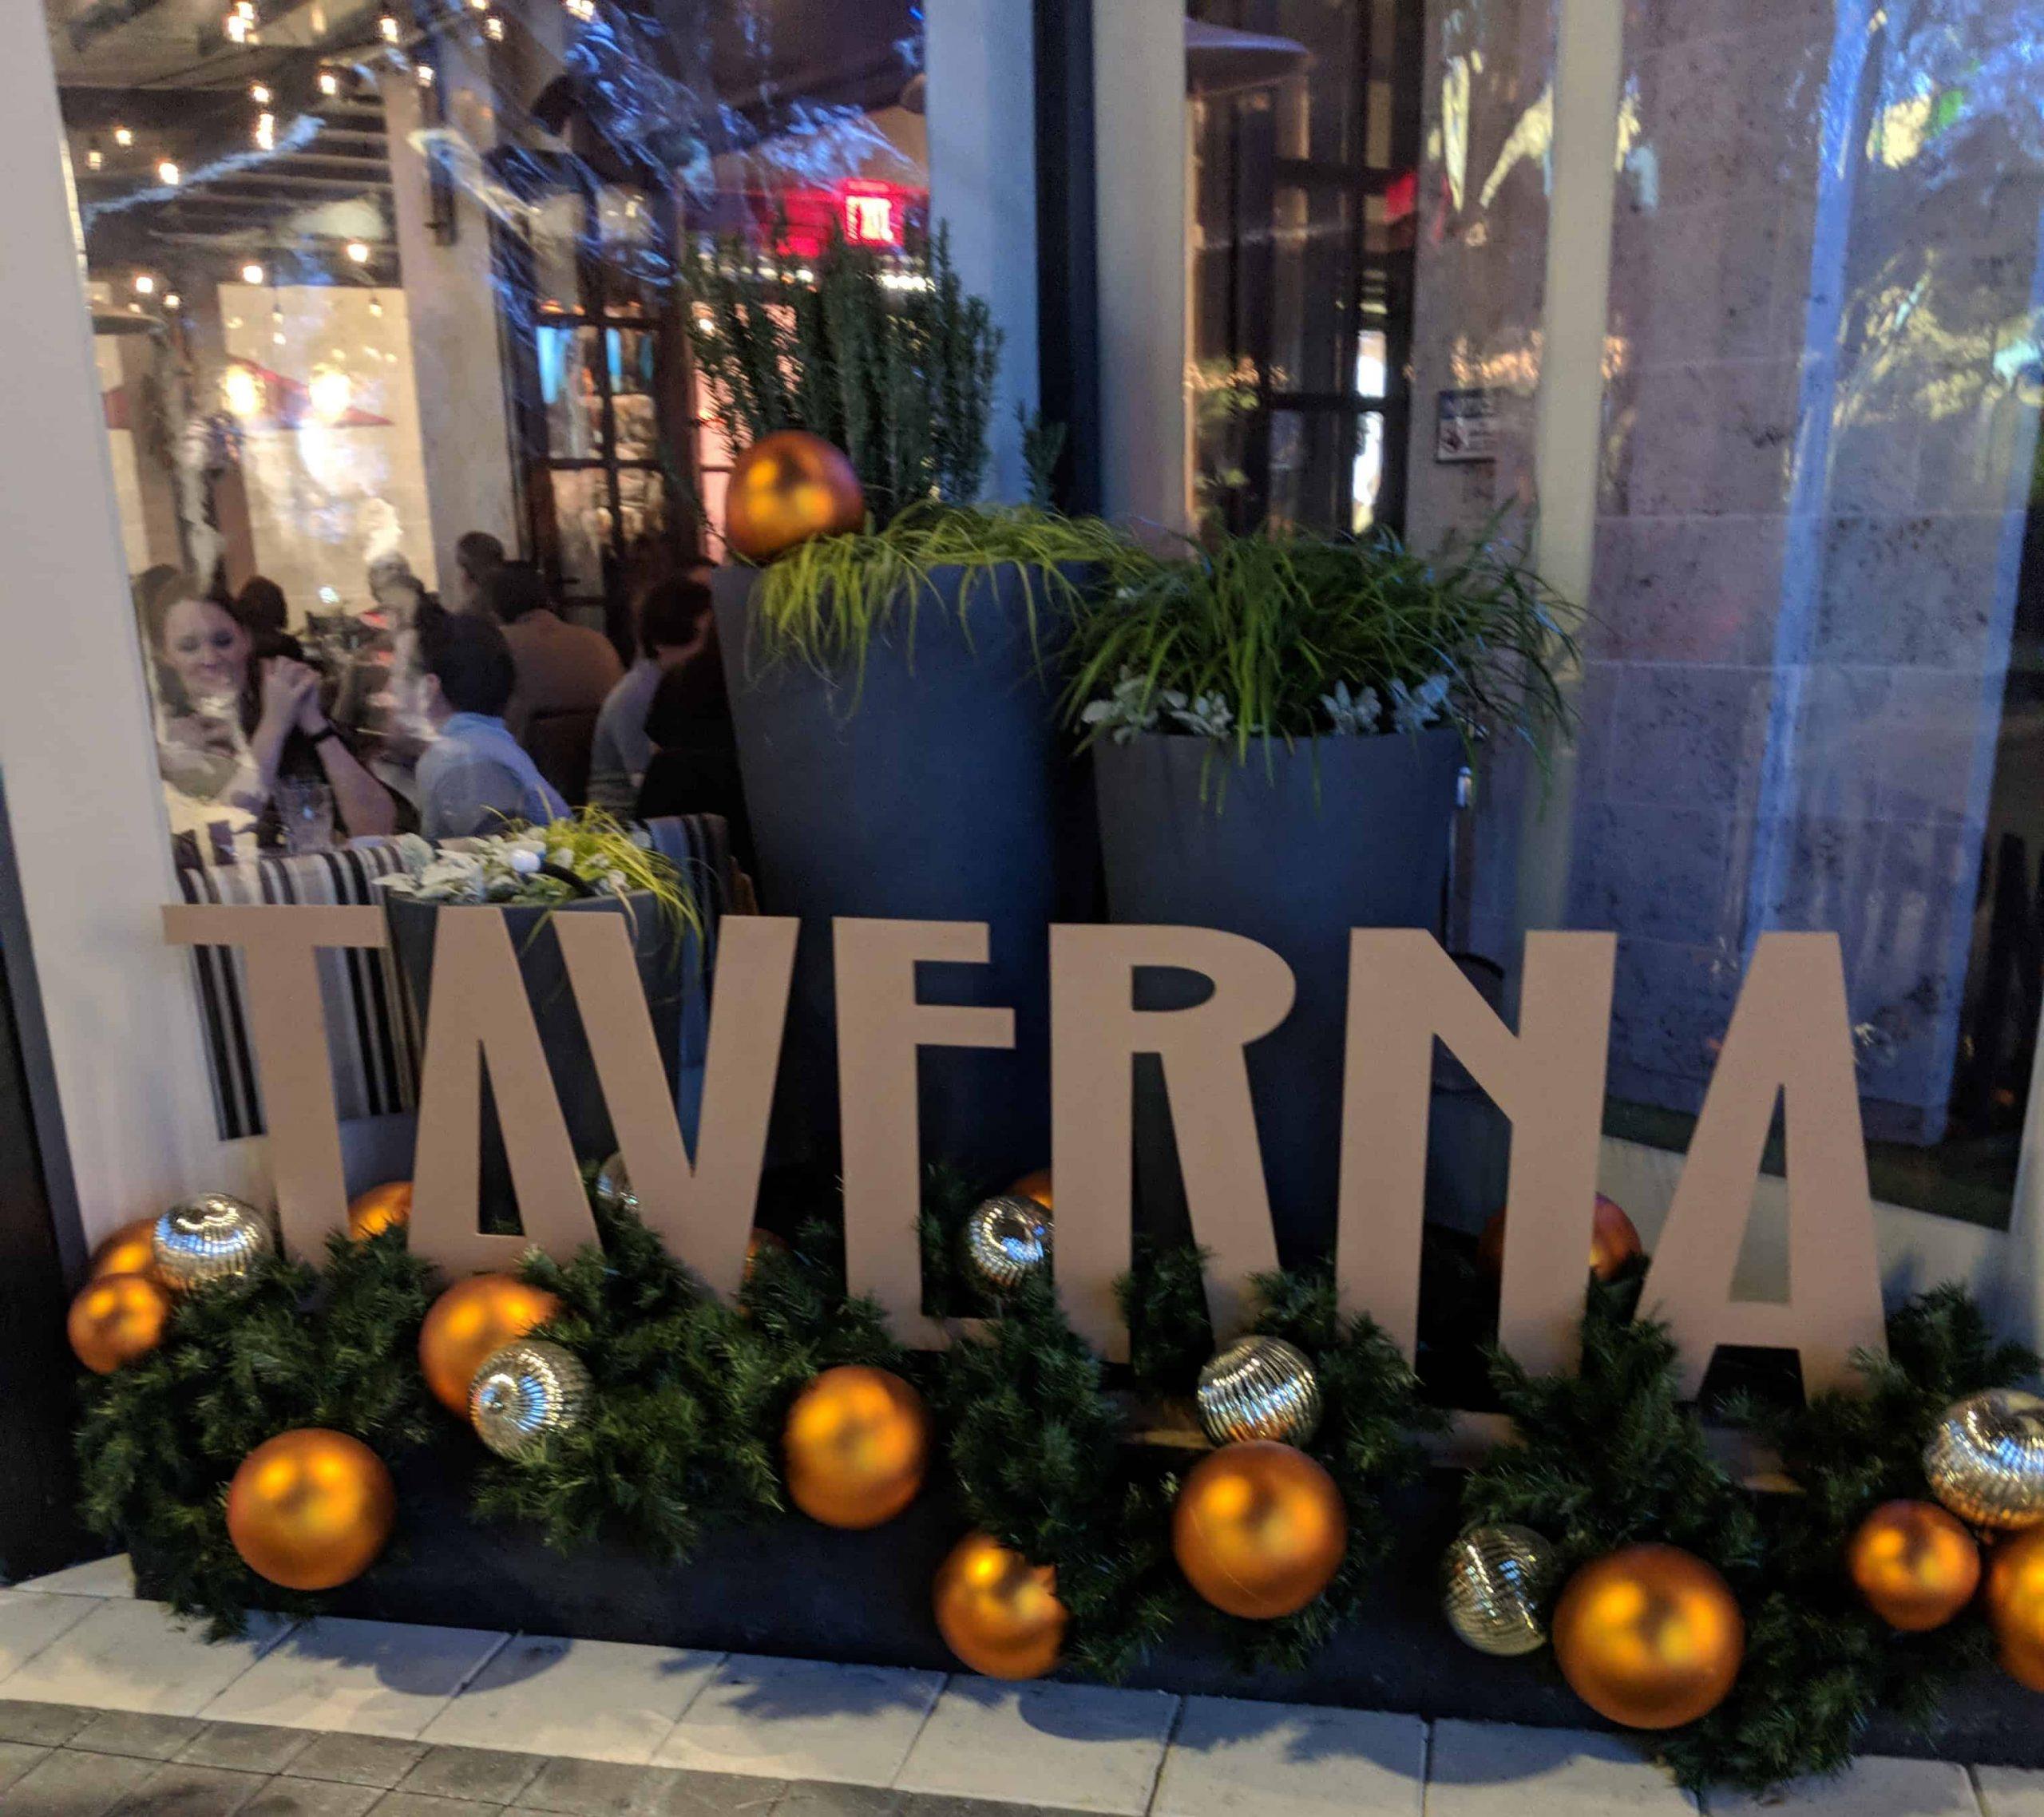 Date Night at Taverna